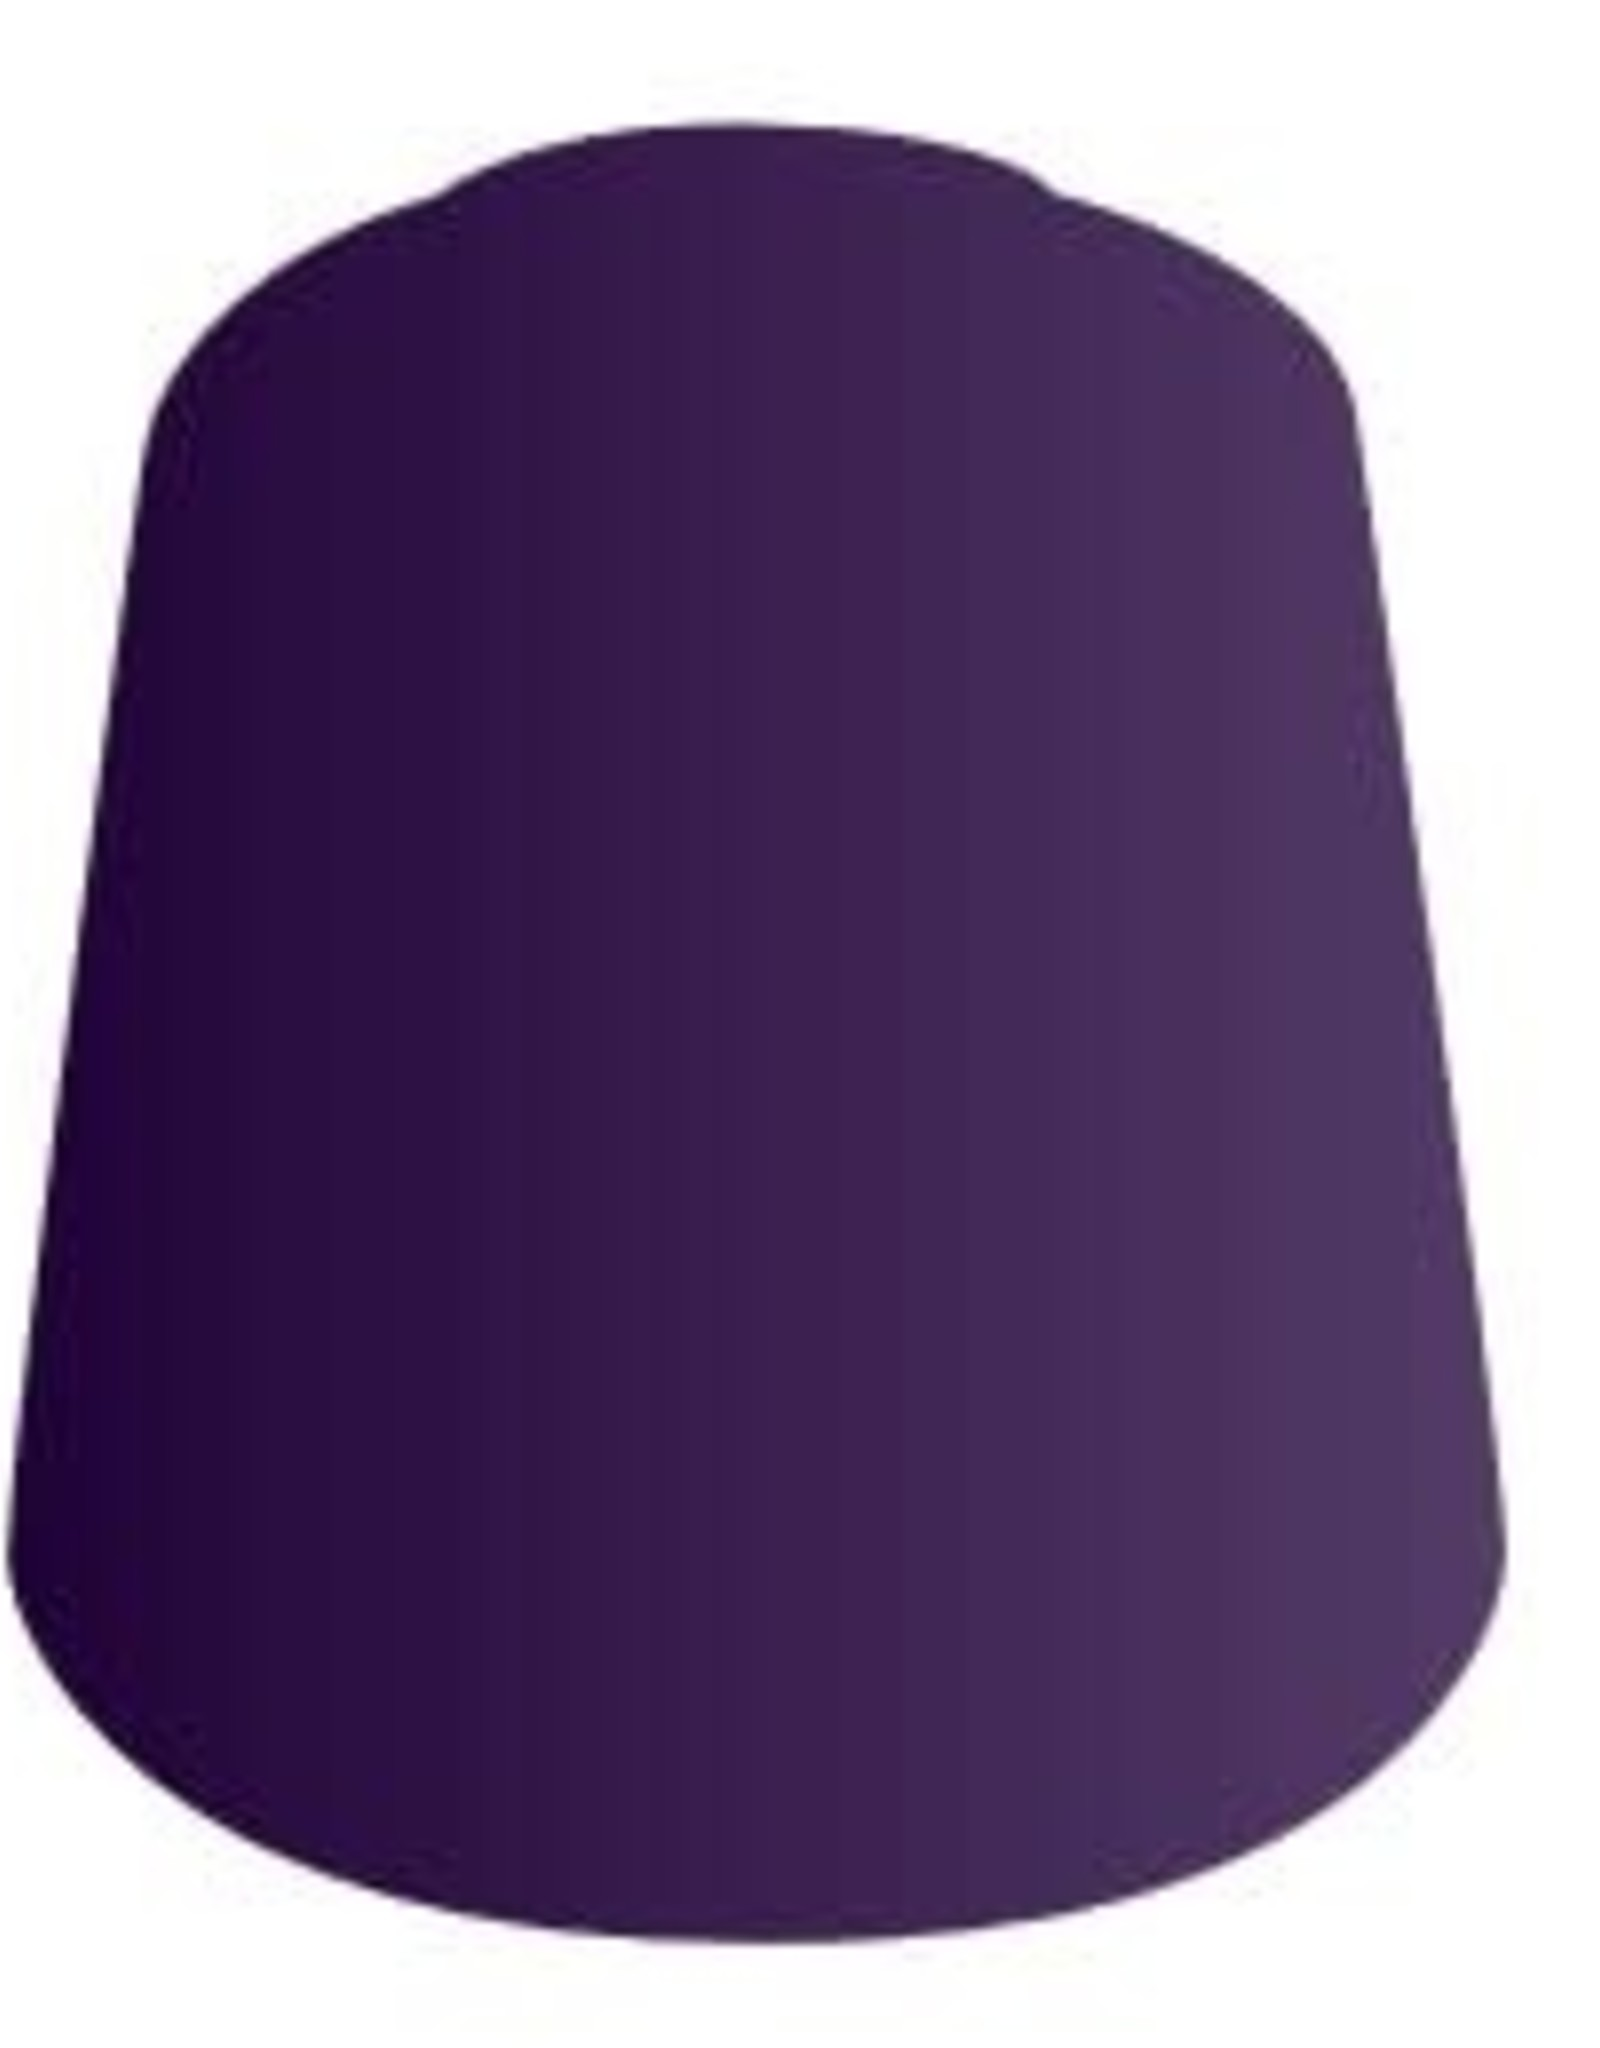 Games Workshop Contrast Shyish Purple